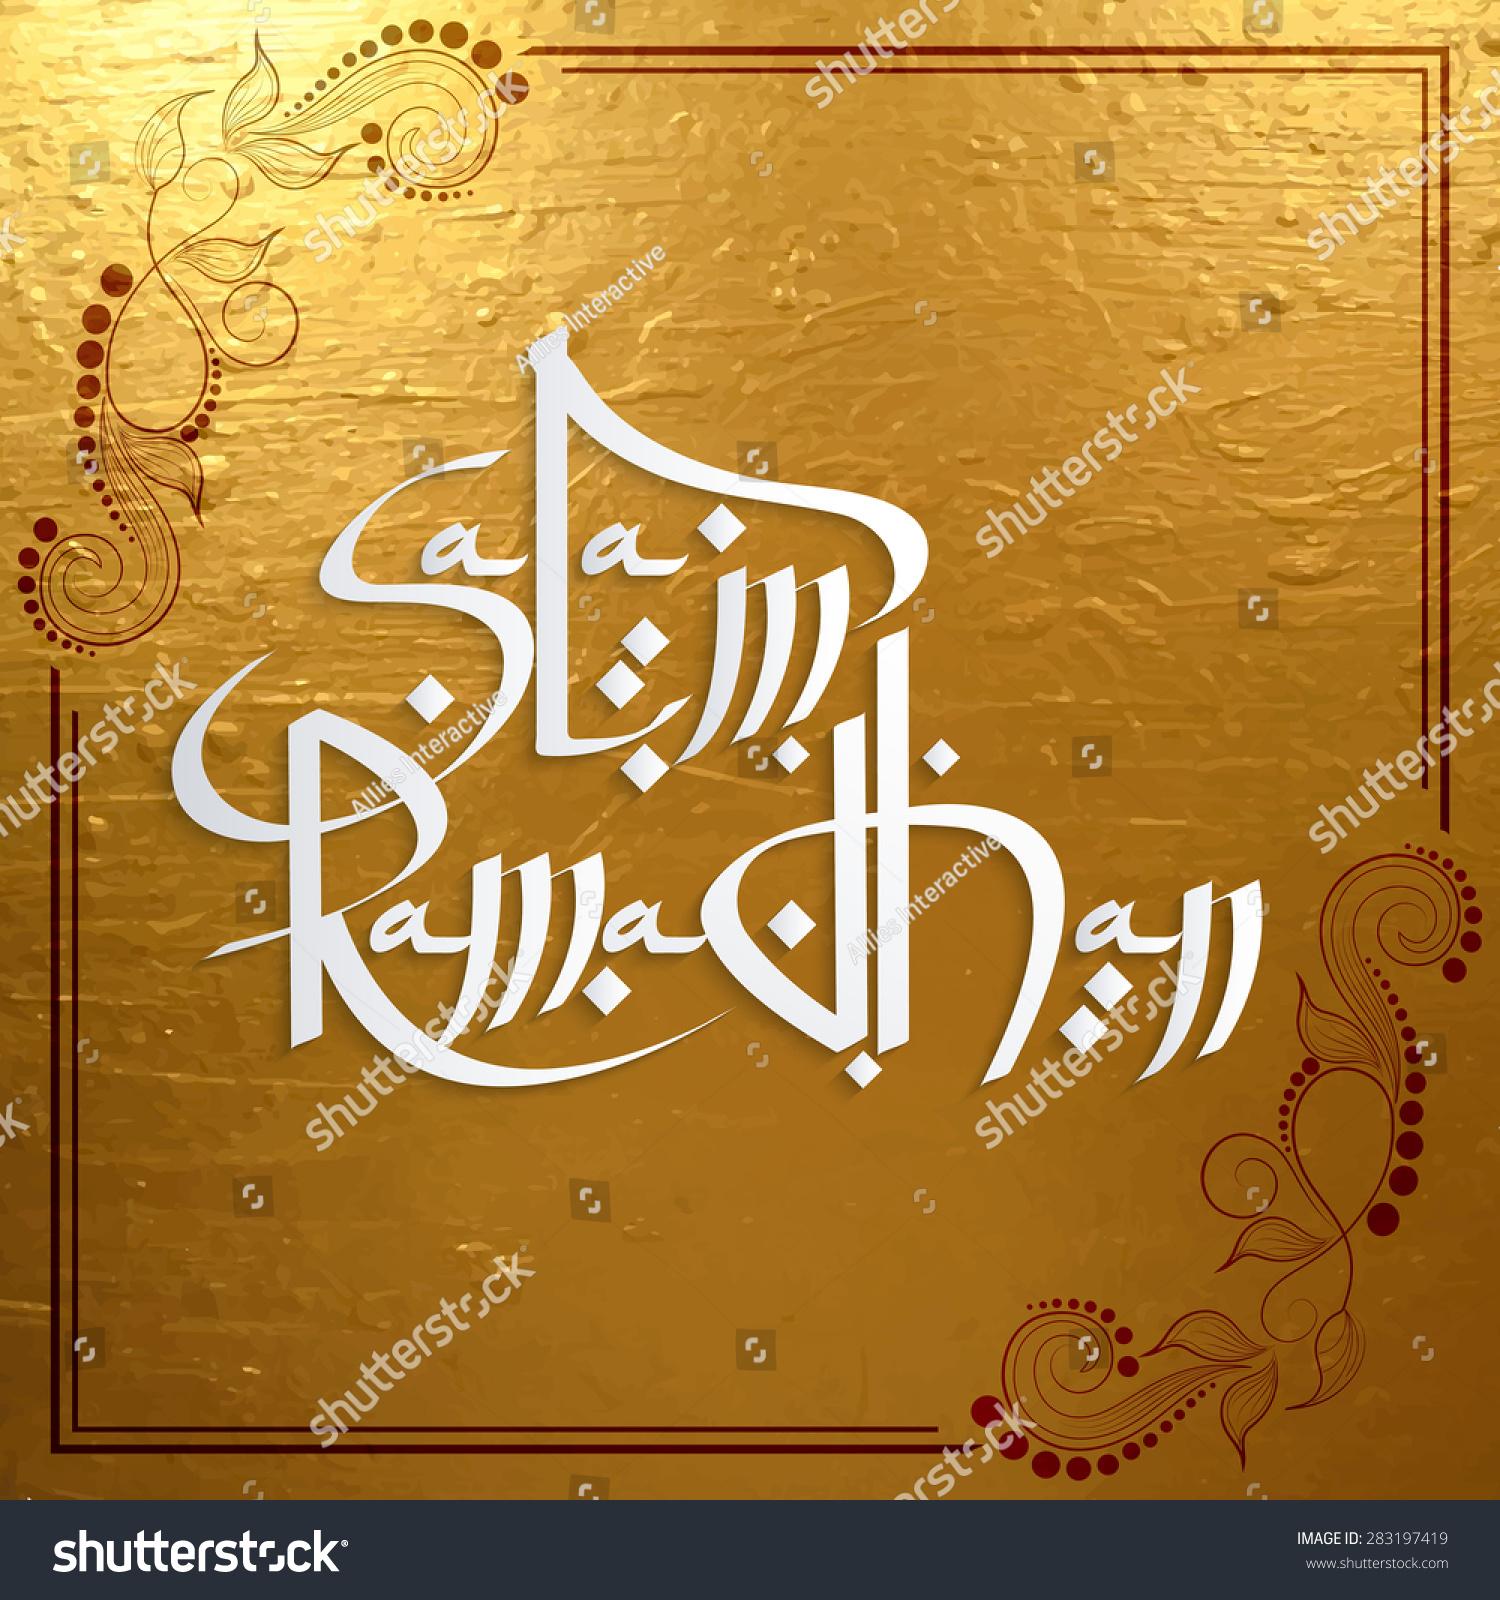 Beautiful Golden Greeting Invitation Card Design Stock Vector